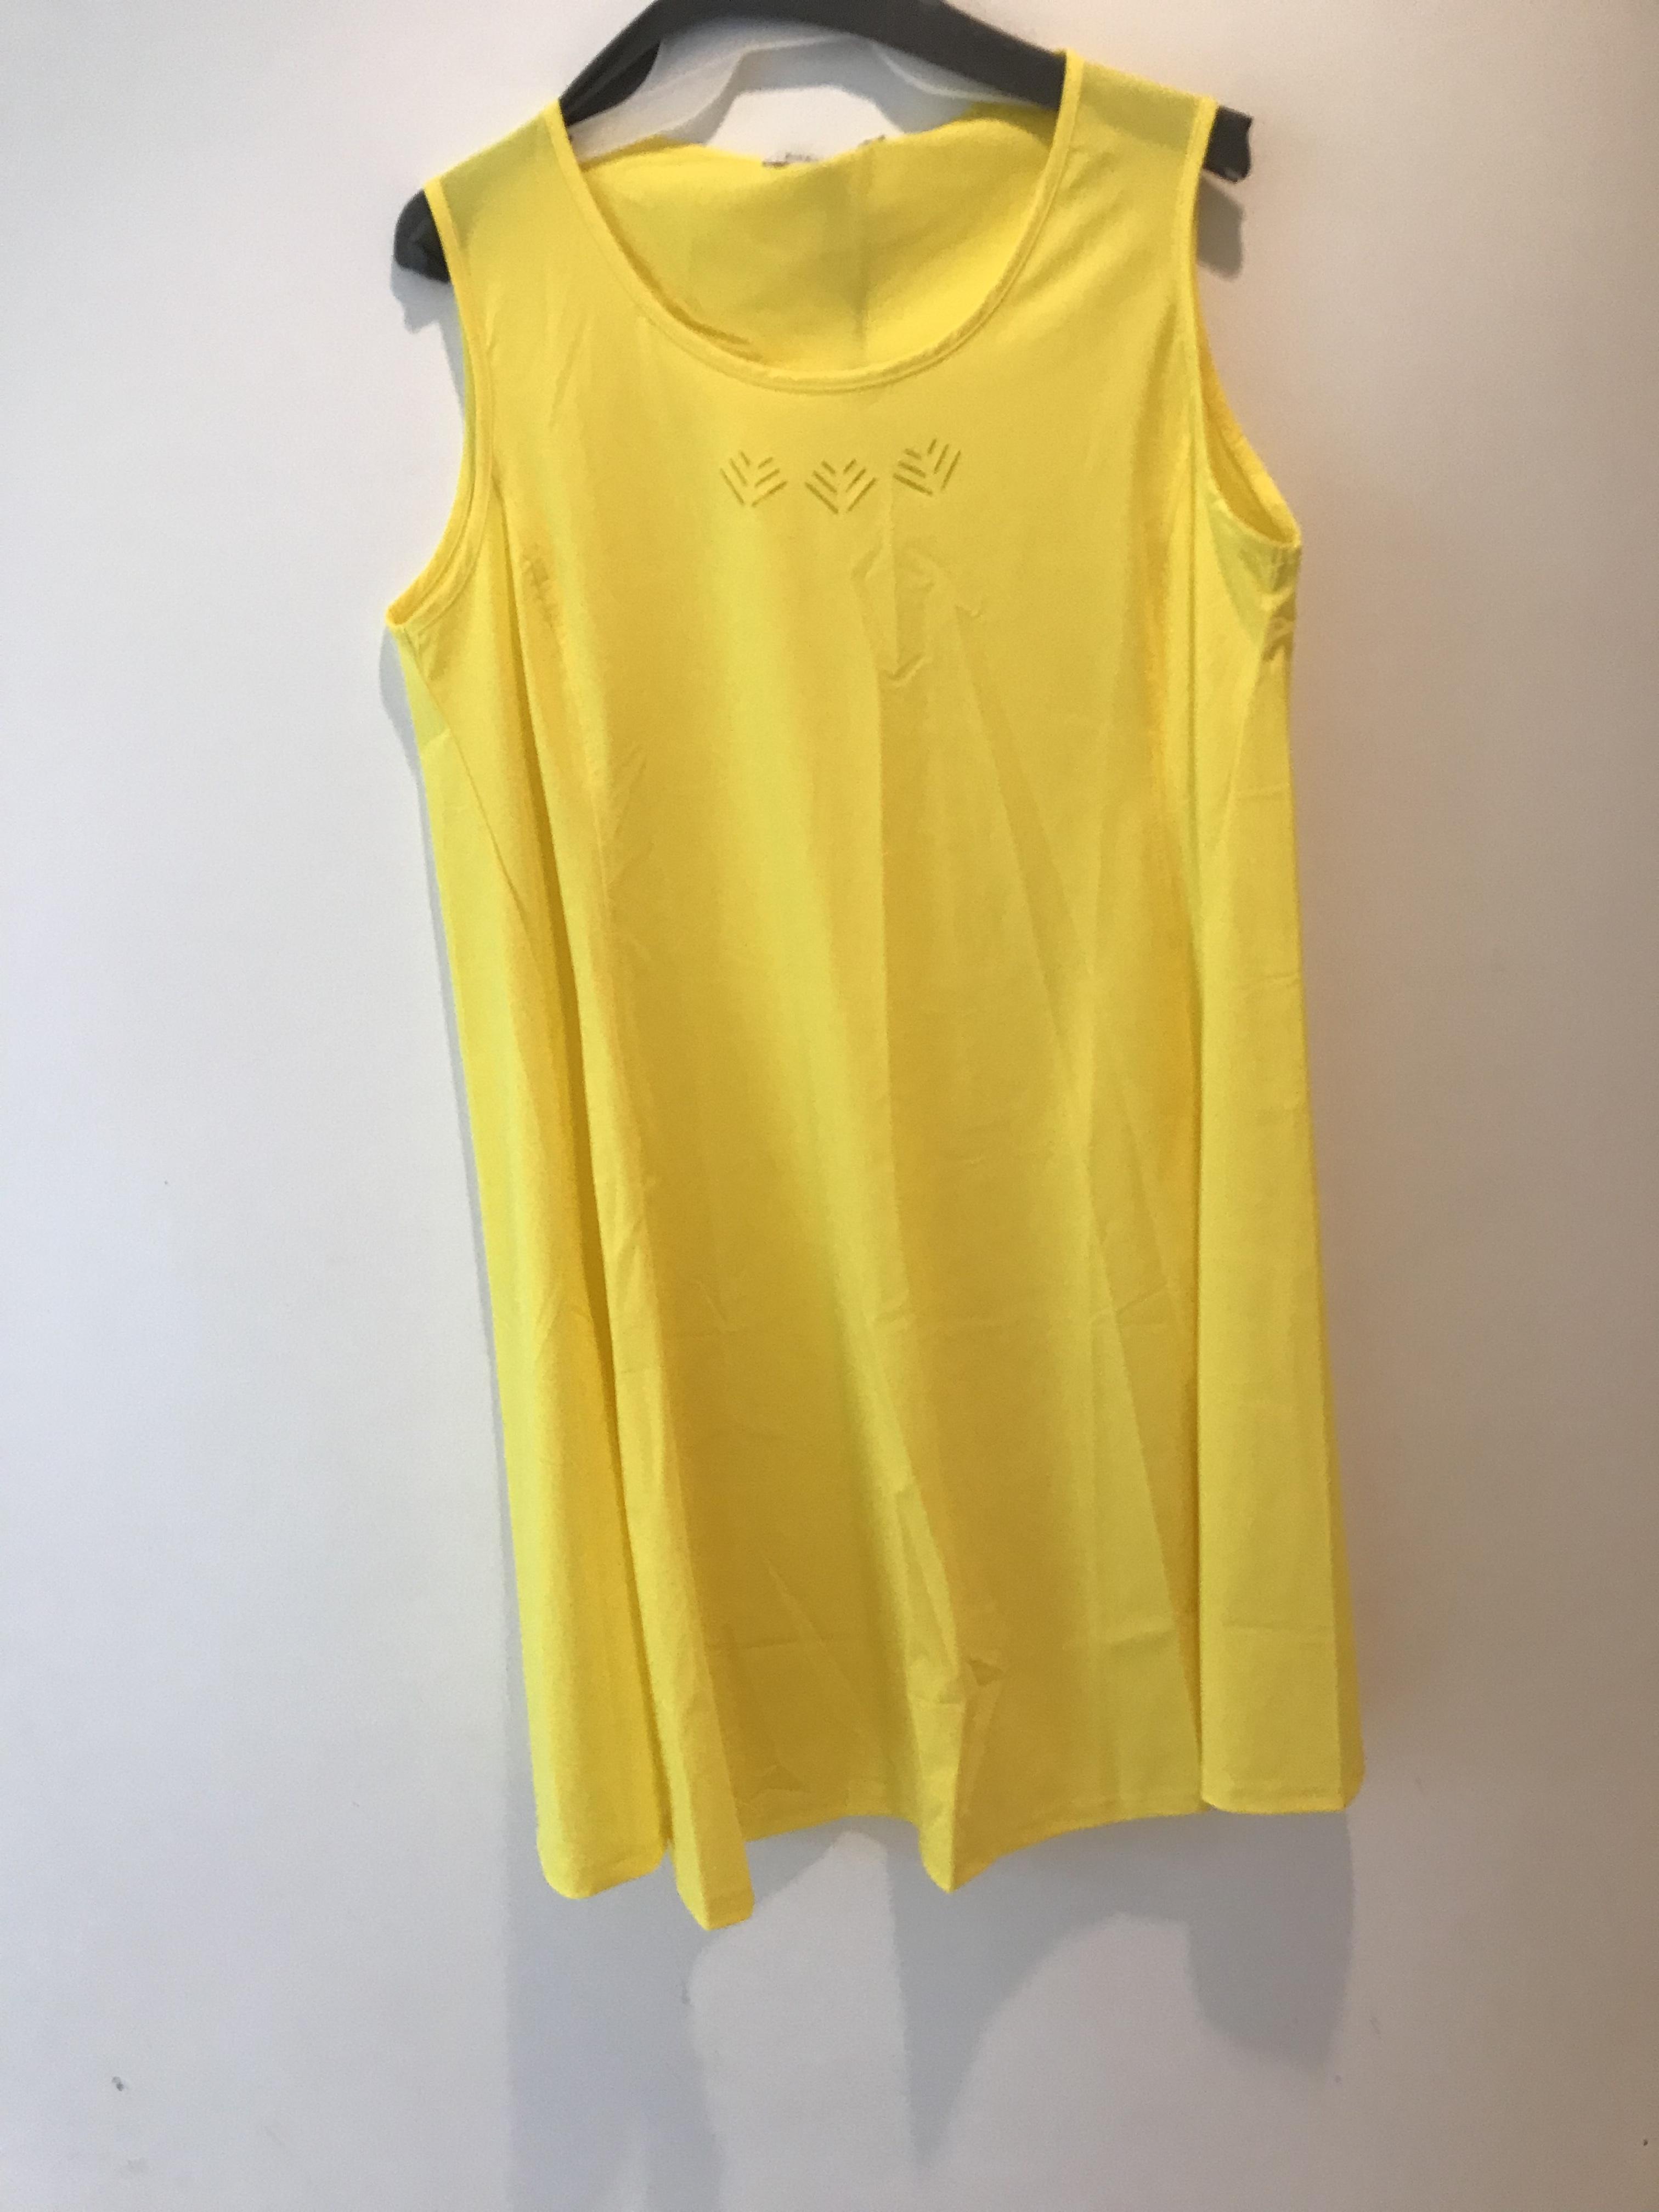 Maloka: Sleek Swirl Decolletage Flare Tunic (Click for more colors!) MK_KAROLE_YELLOW